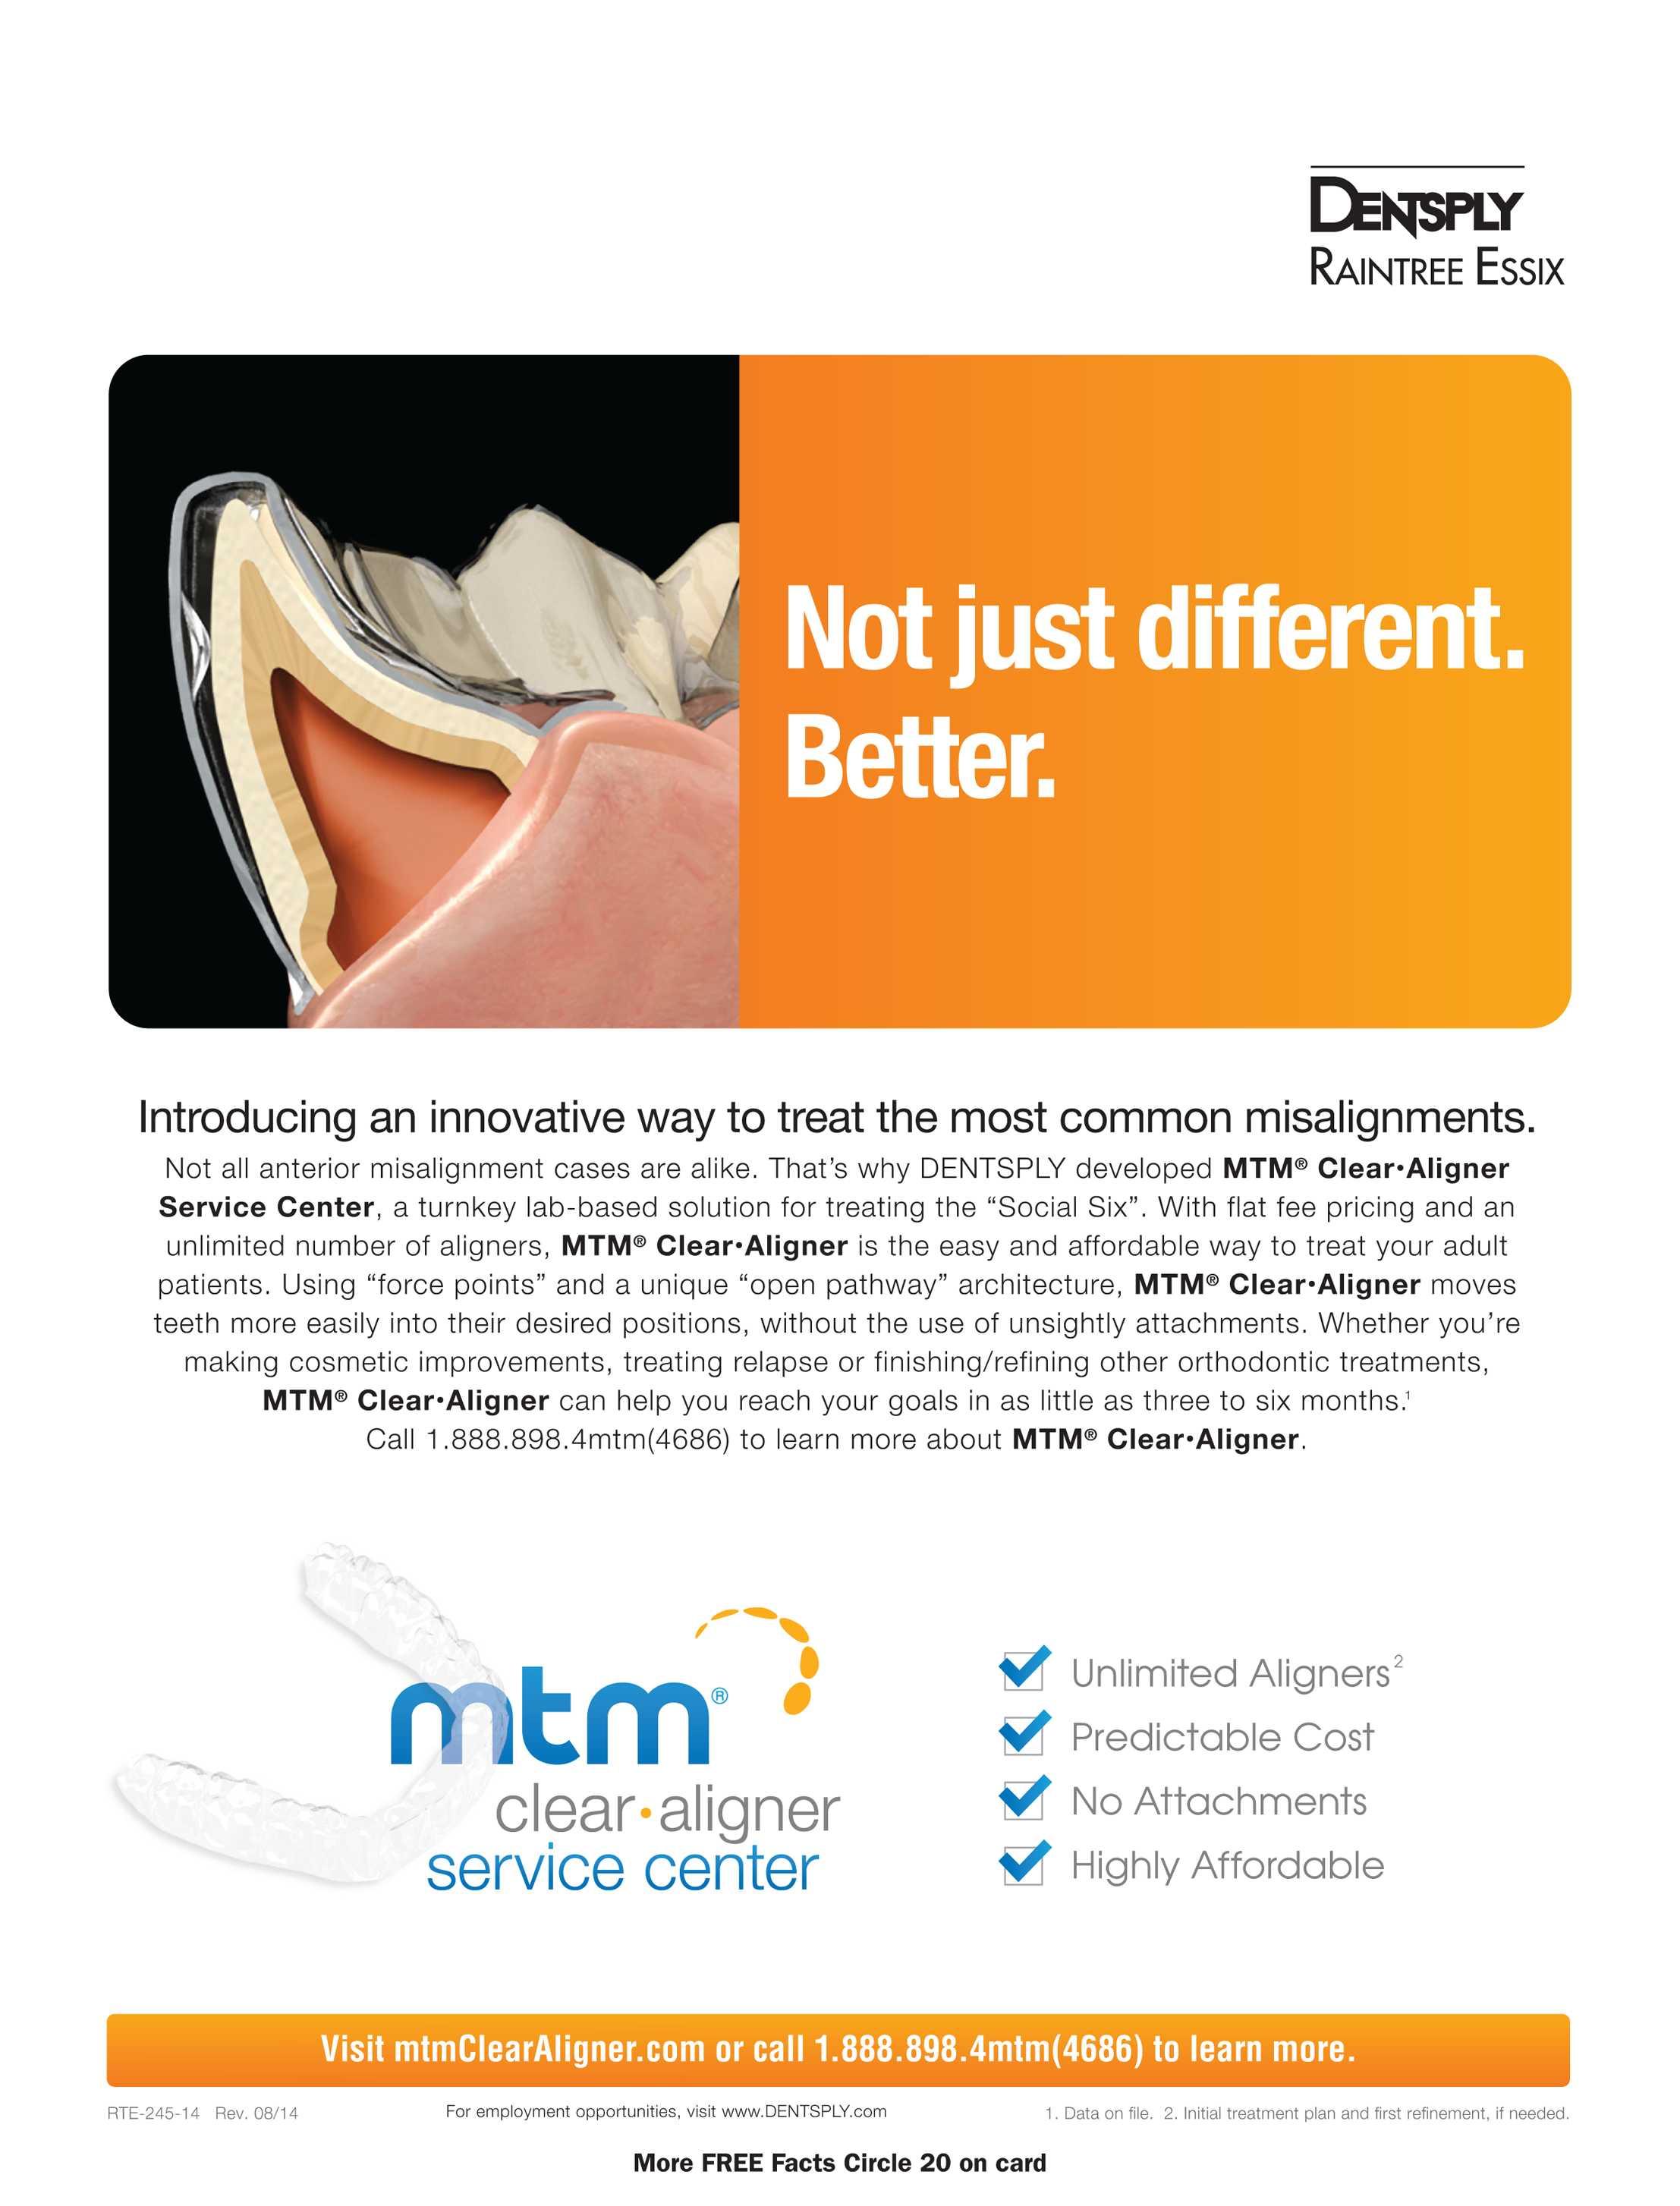 Dental Economics - October 2014 - page 43